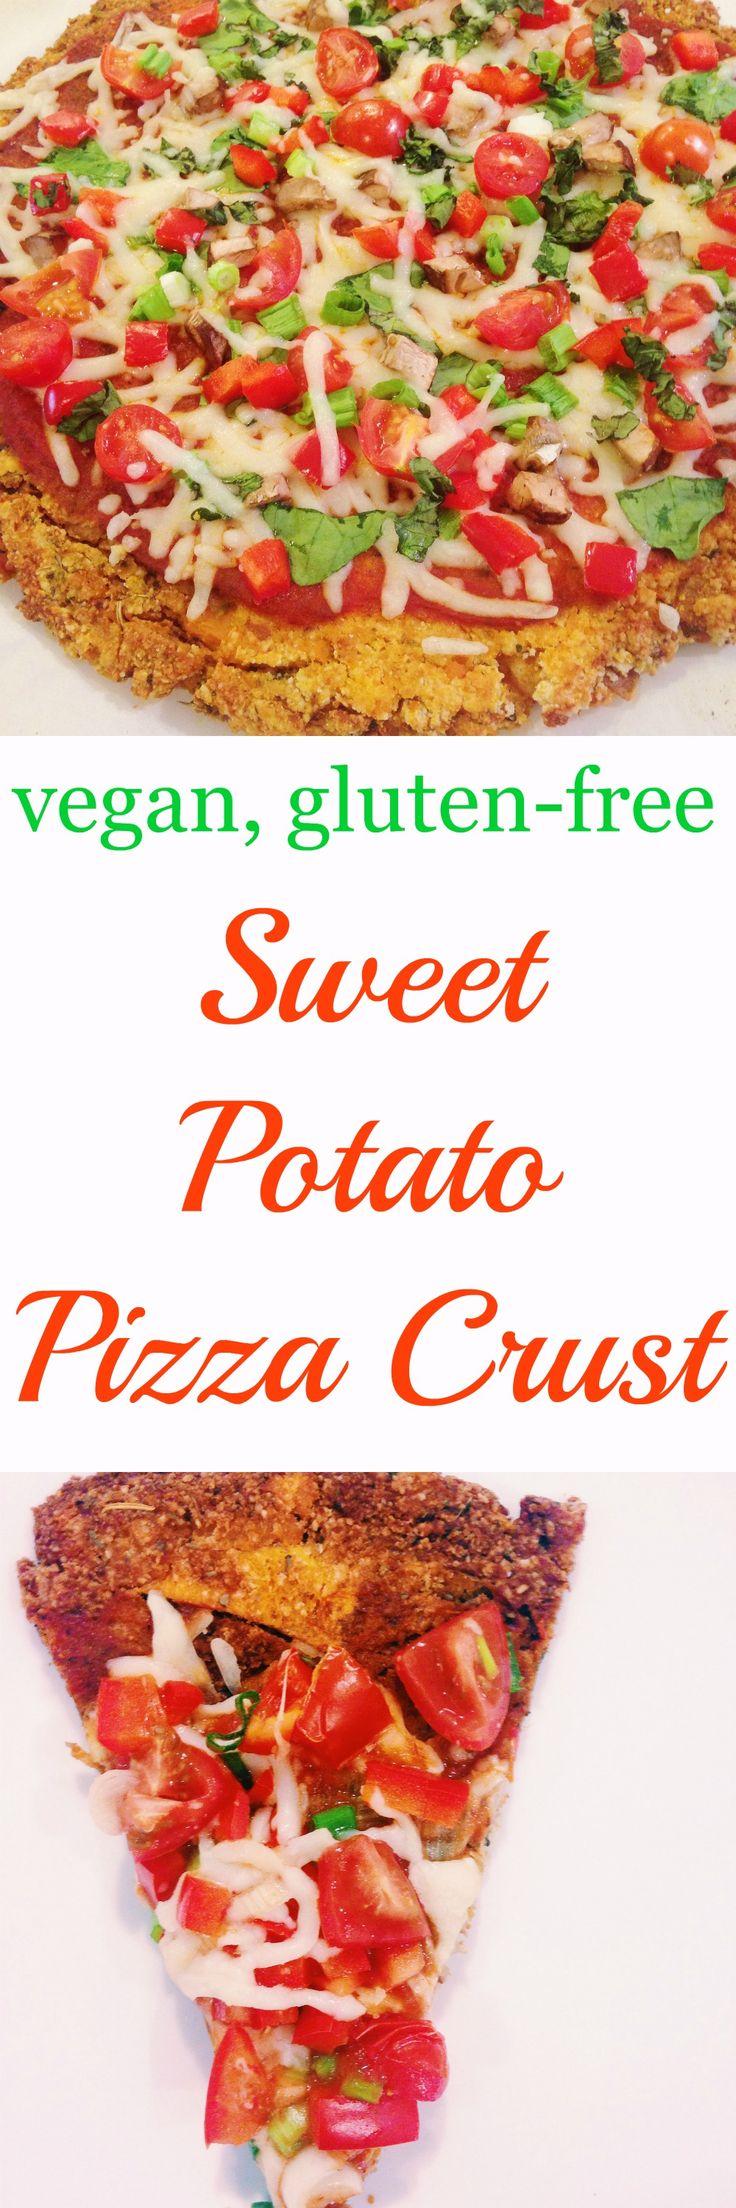 Sweet Potato Pizza Crust - vegan, gluten free